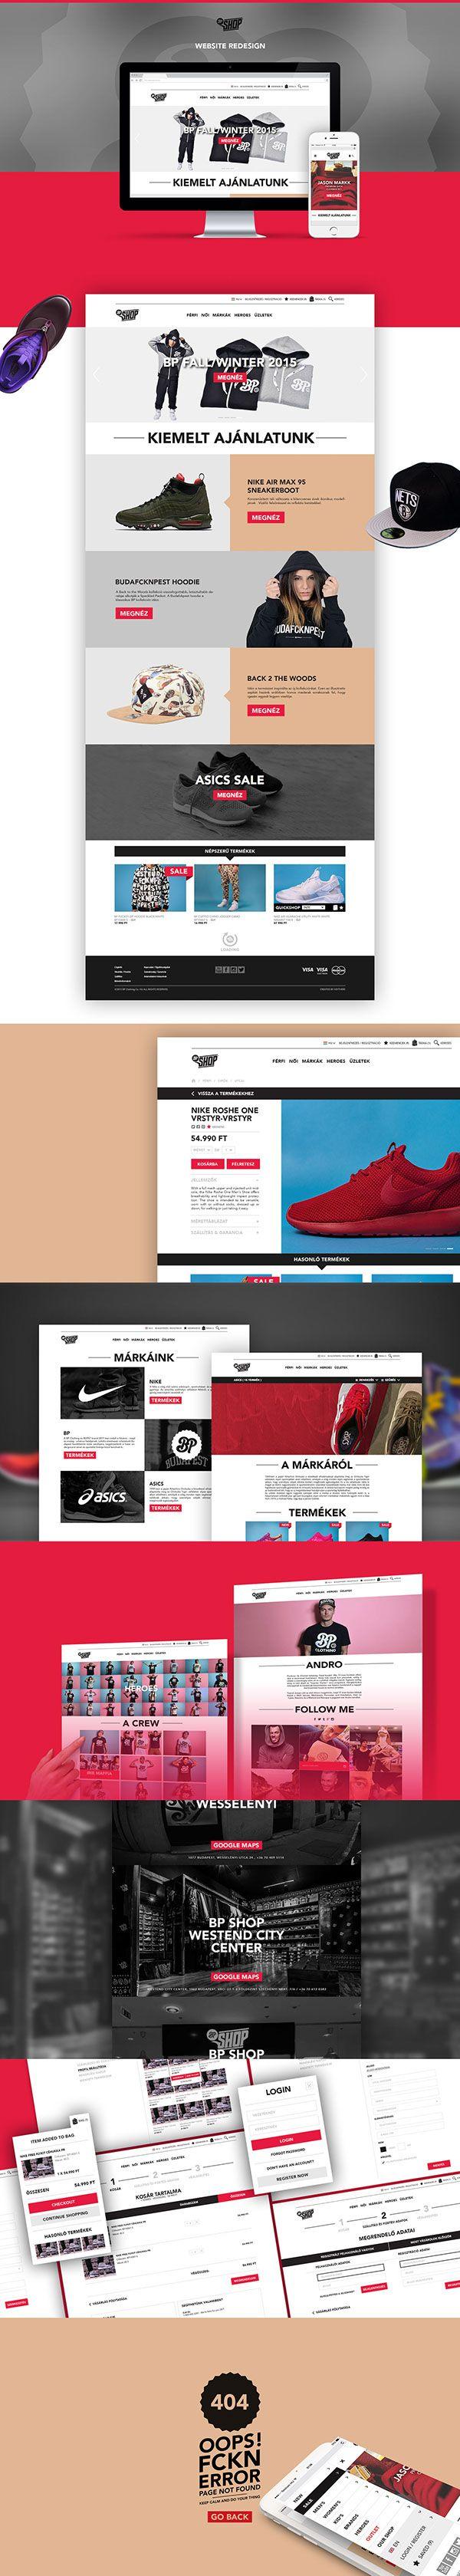 BP Shop website #webdesign #website #ui #ux #userinterface #userexperience #sitedesign